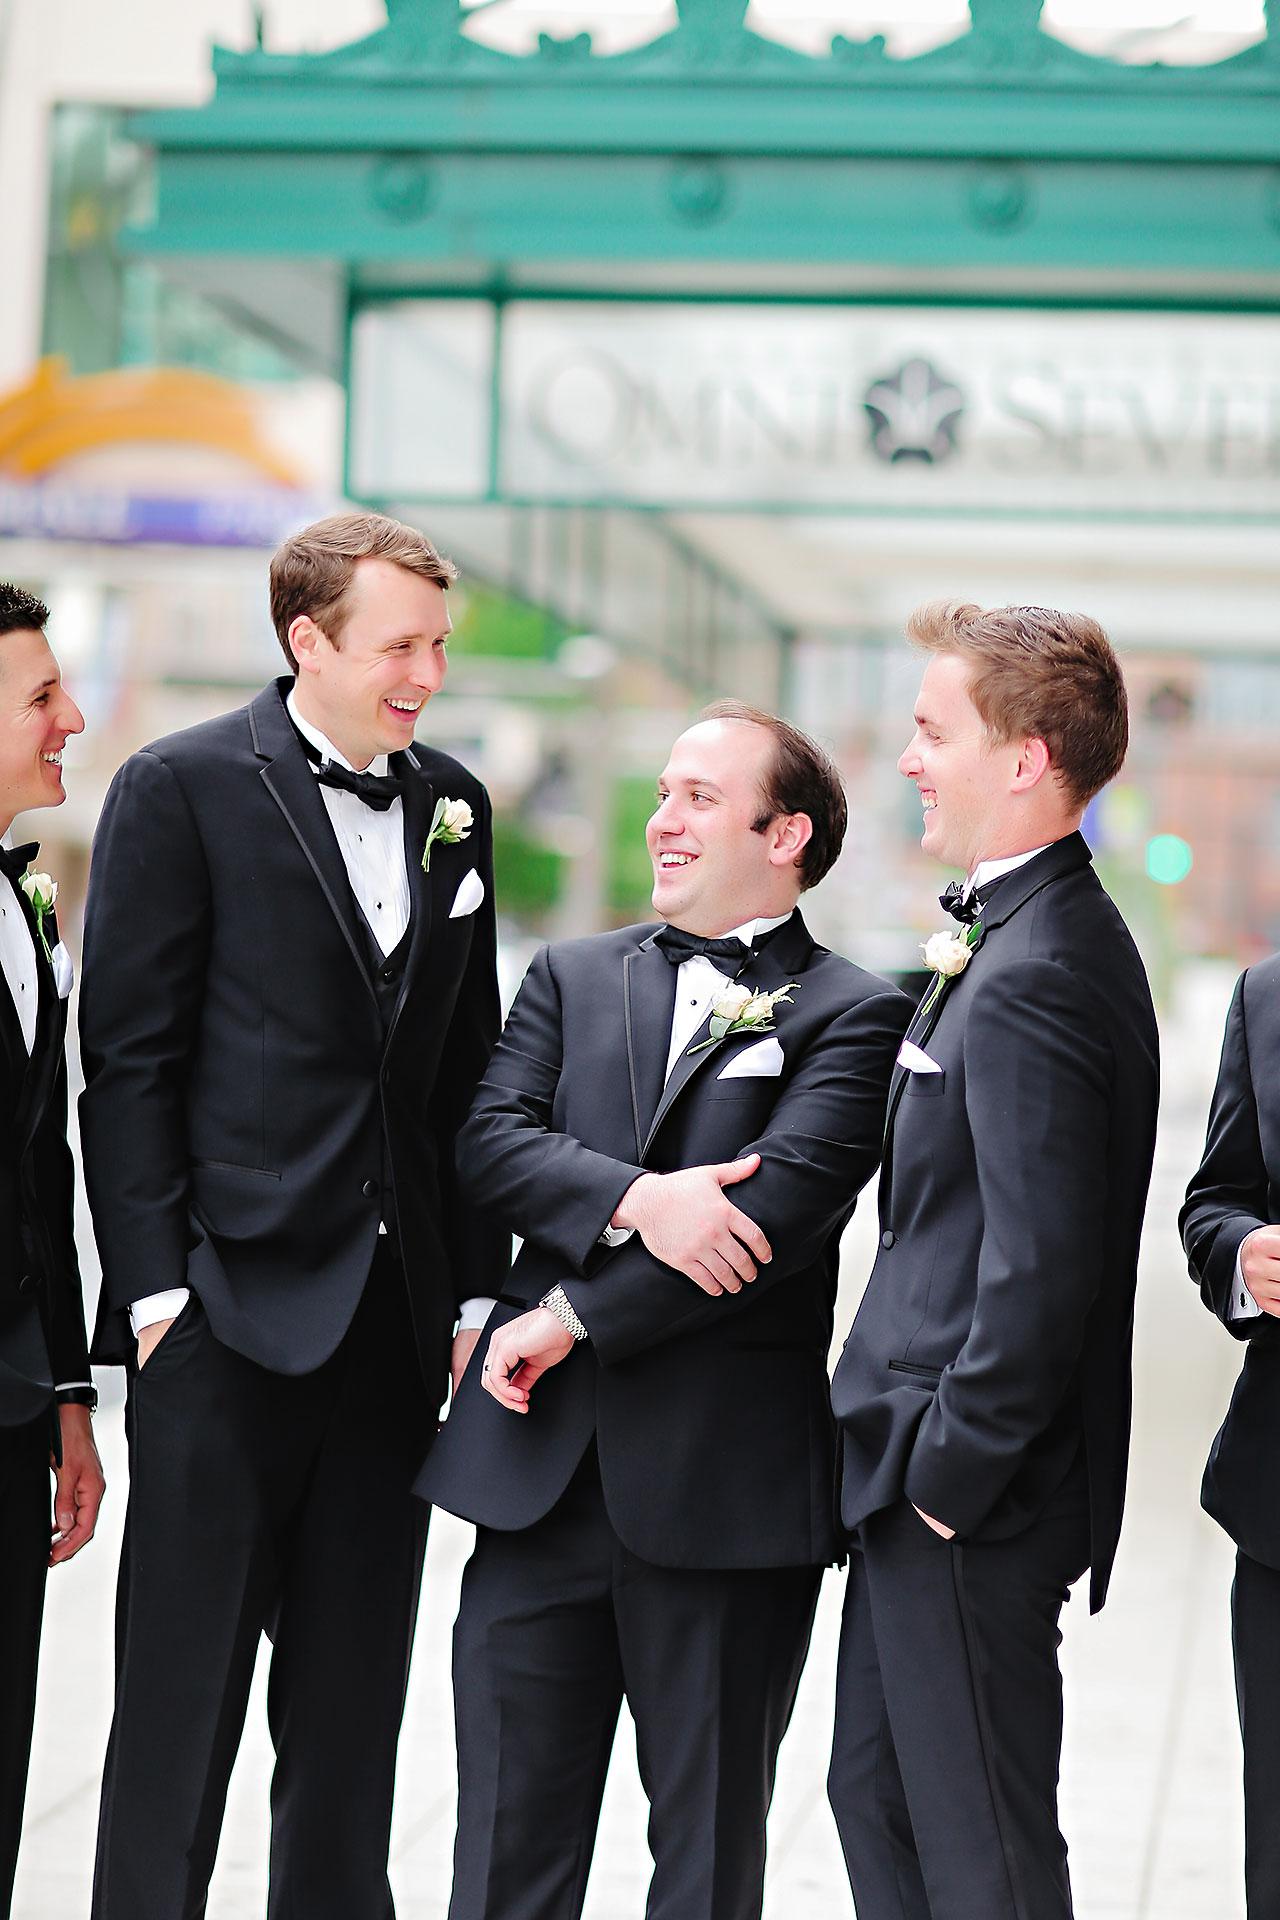 Allison Jeff Union Station Crowne Plaza Indianapolis wedding 077